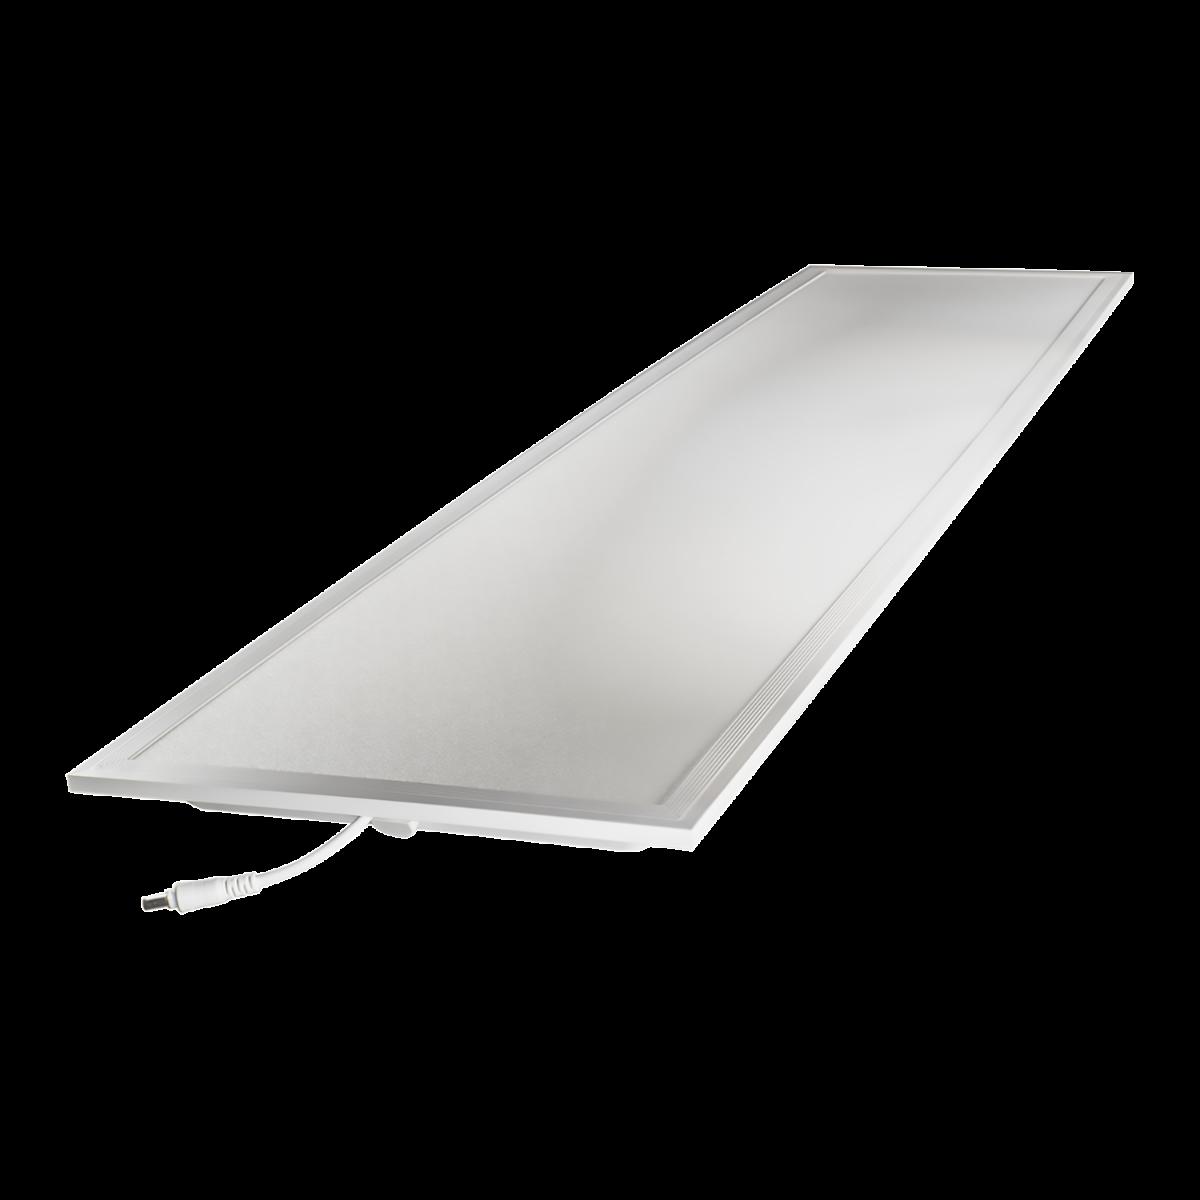 Noxion LED Panel Delta Pro Highlum V2.0 40W 30x120cm 3000K 5280lm UGR <19 | Varm Vit - Ersättare 2x36W